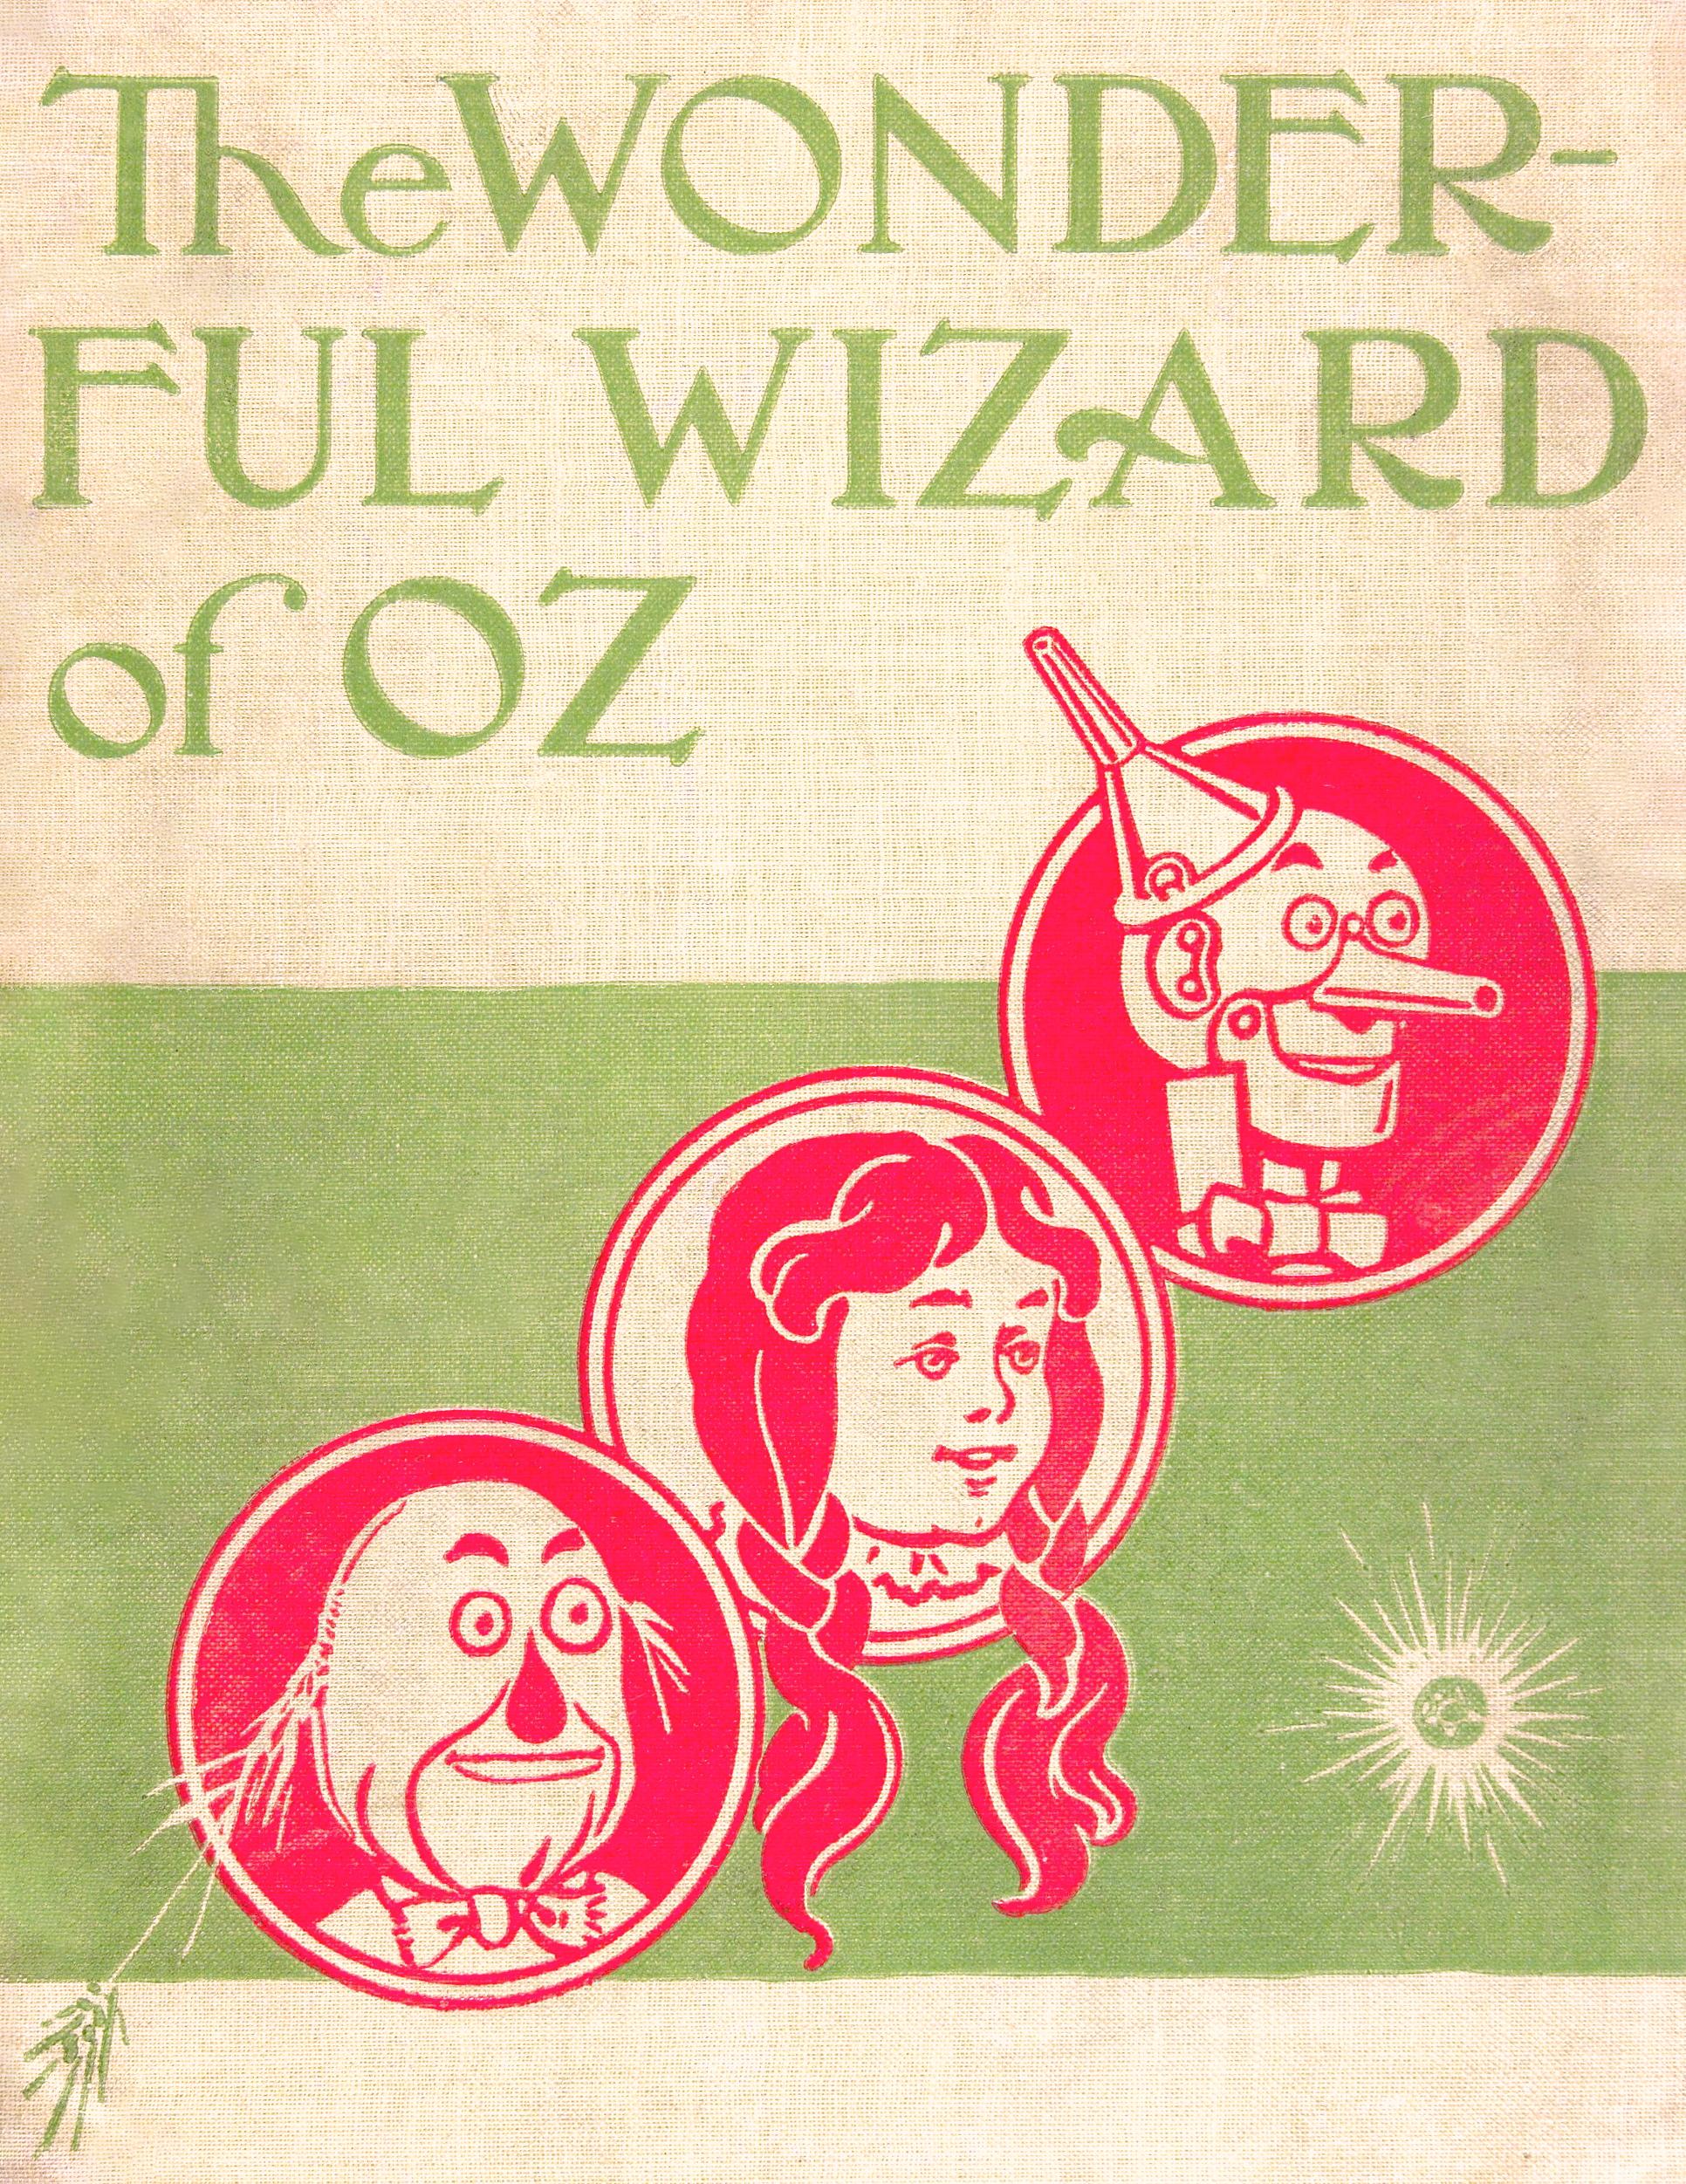 Denslow Wizard Of Oz Poster 17 Winged Monkeys Carry Dorothy Back To Oz W W